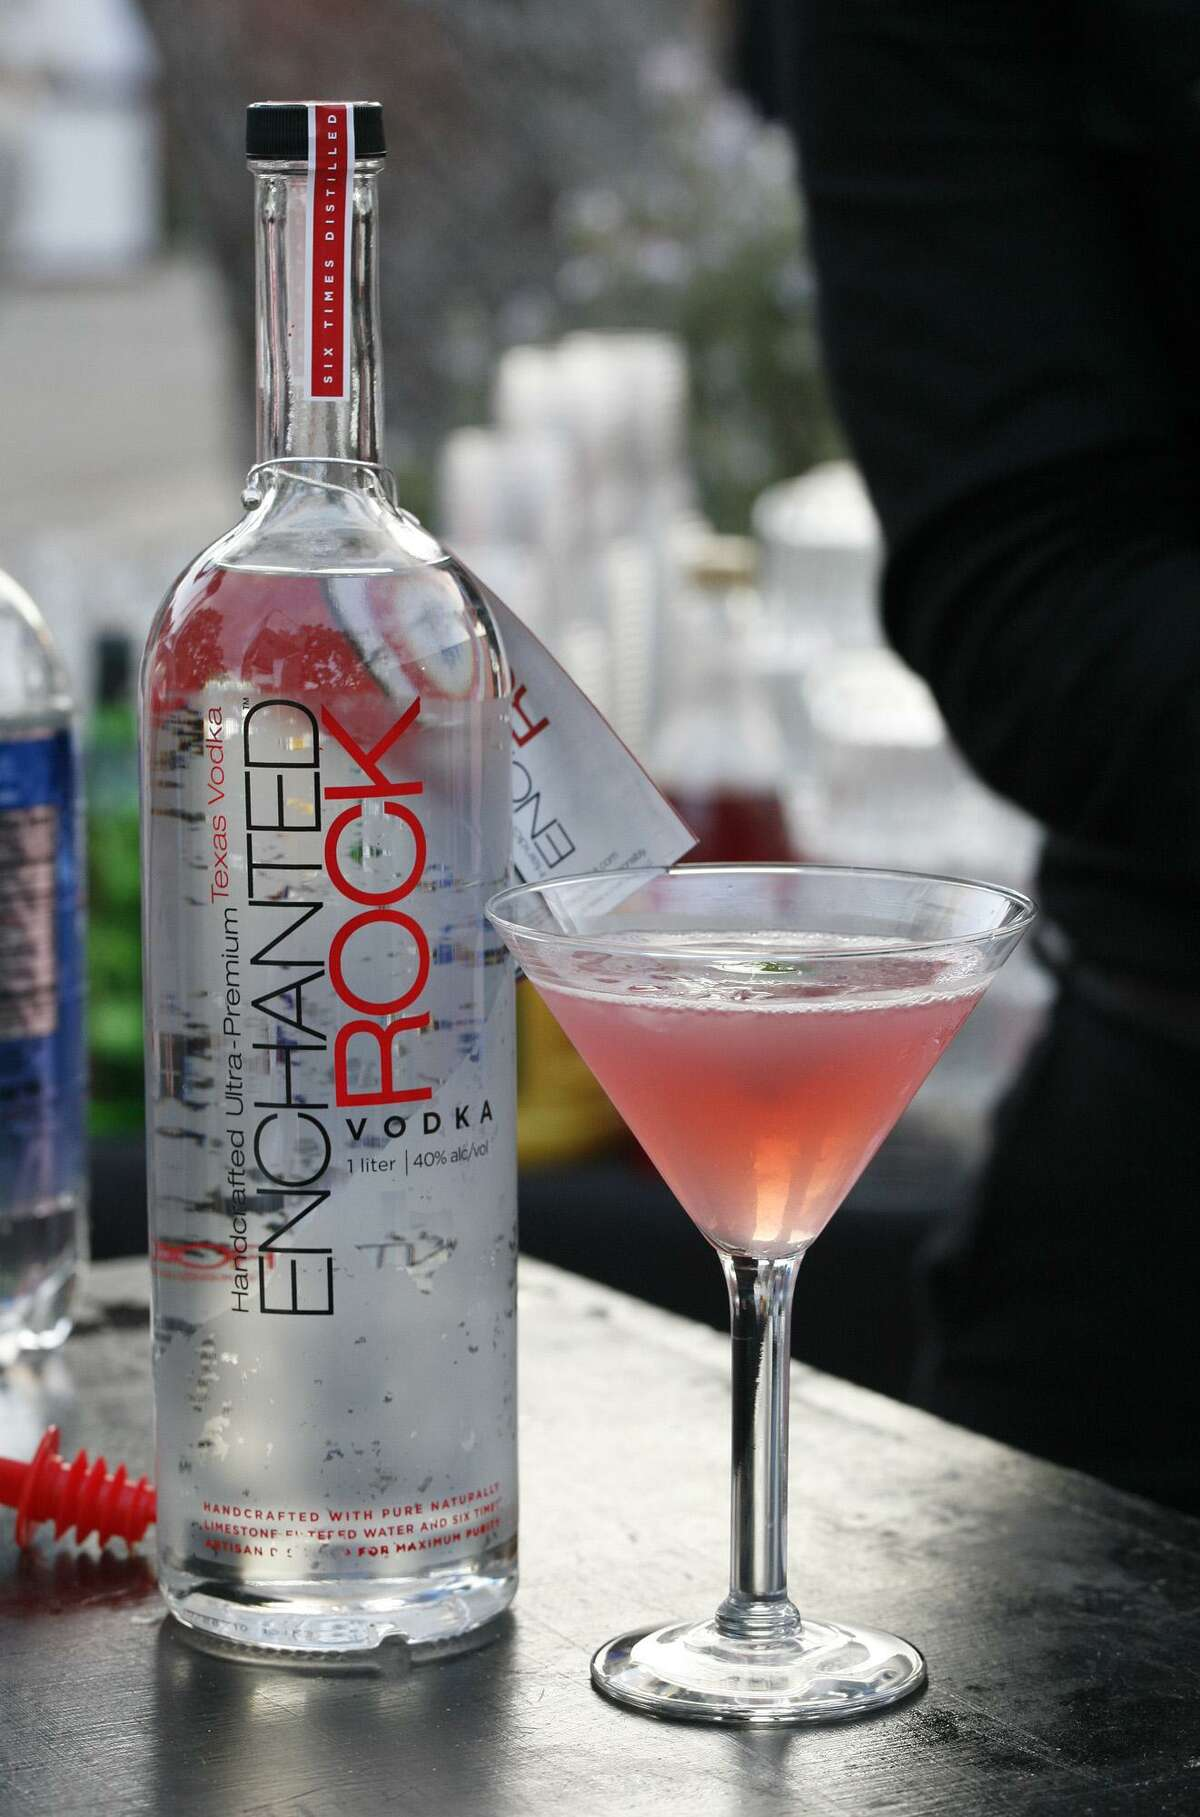 Enchanted Rock Vodka and a cosmopolitan at Rebecca Creek Distillery